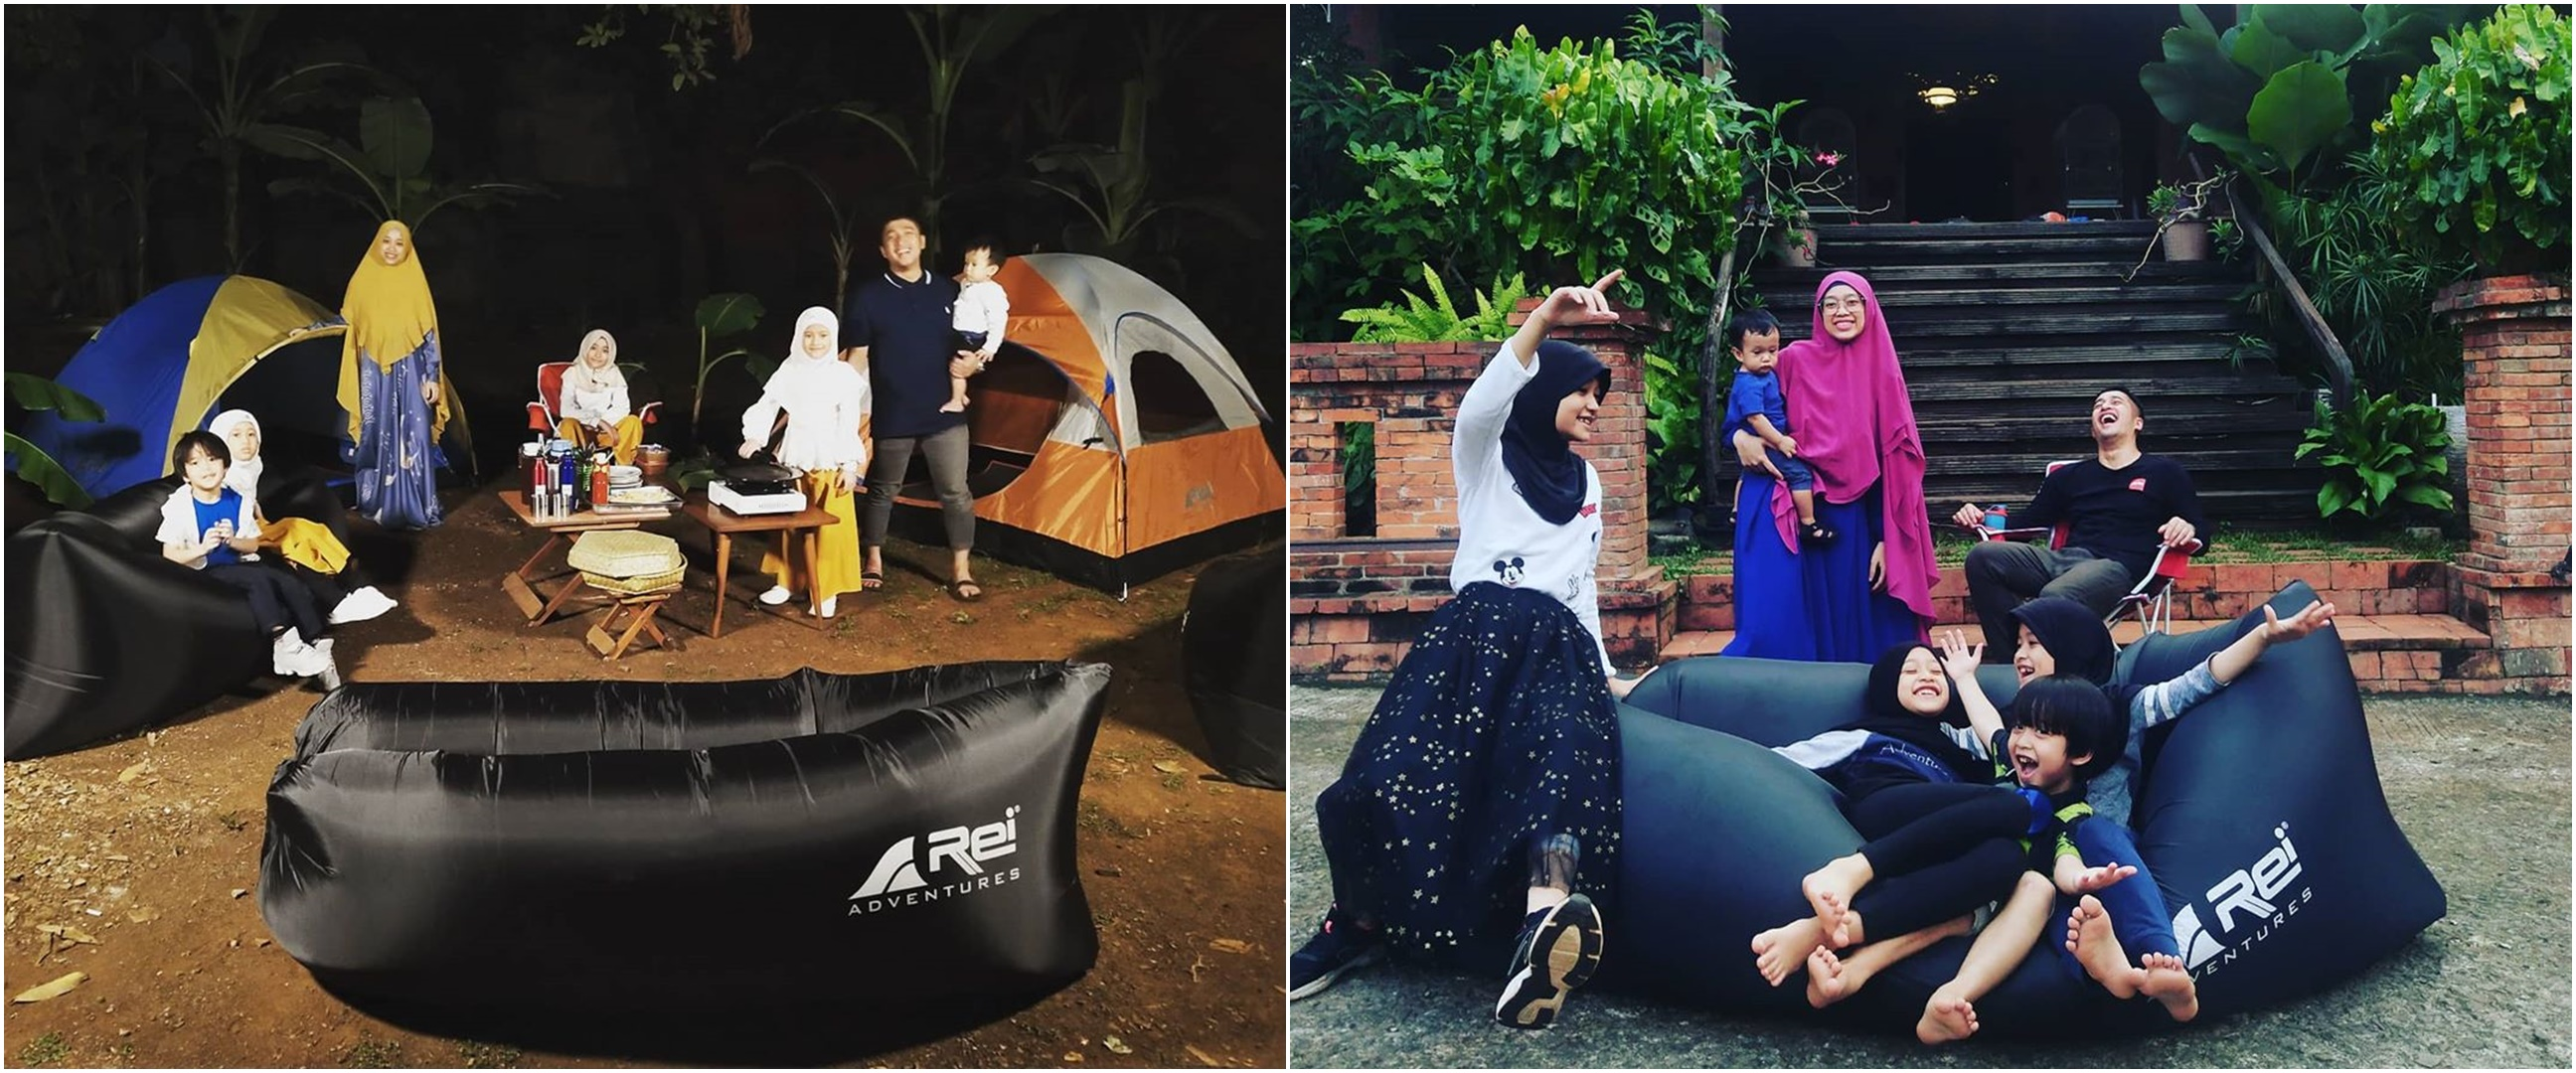 7 Potret keseruan Irfan Hakim kemah bareng keluarga di rumah